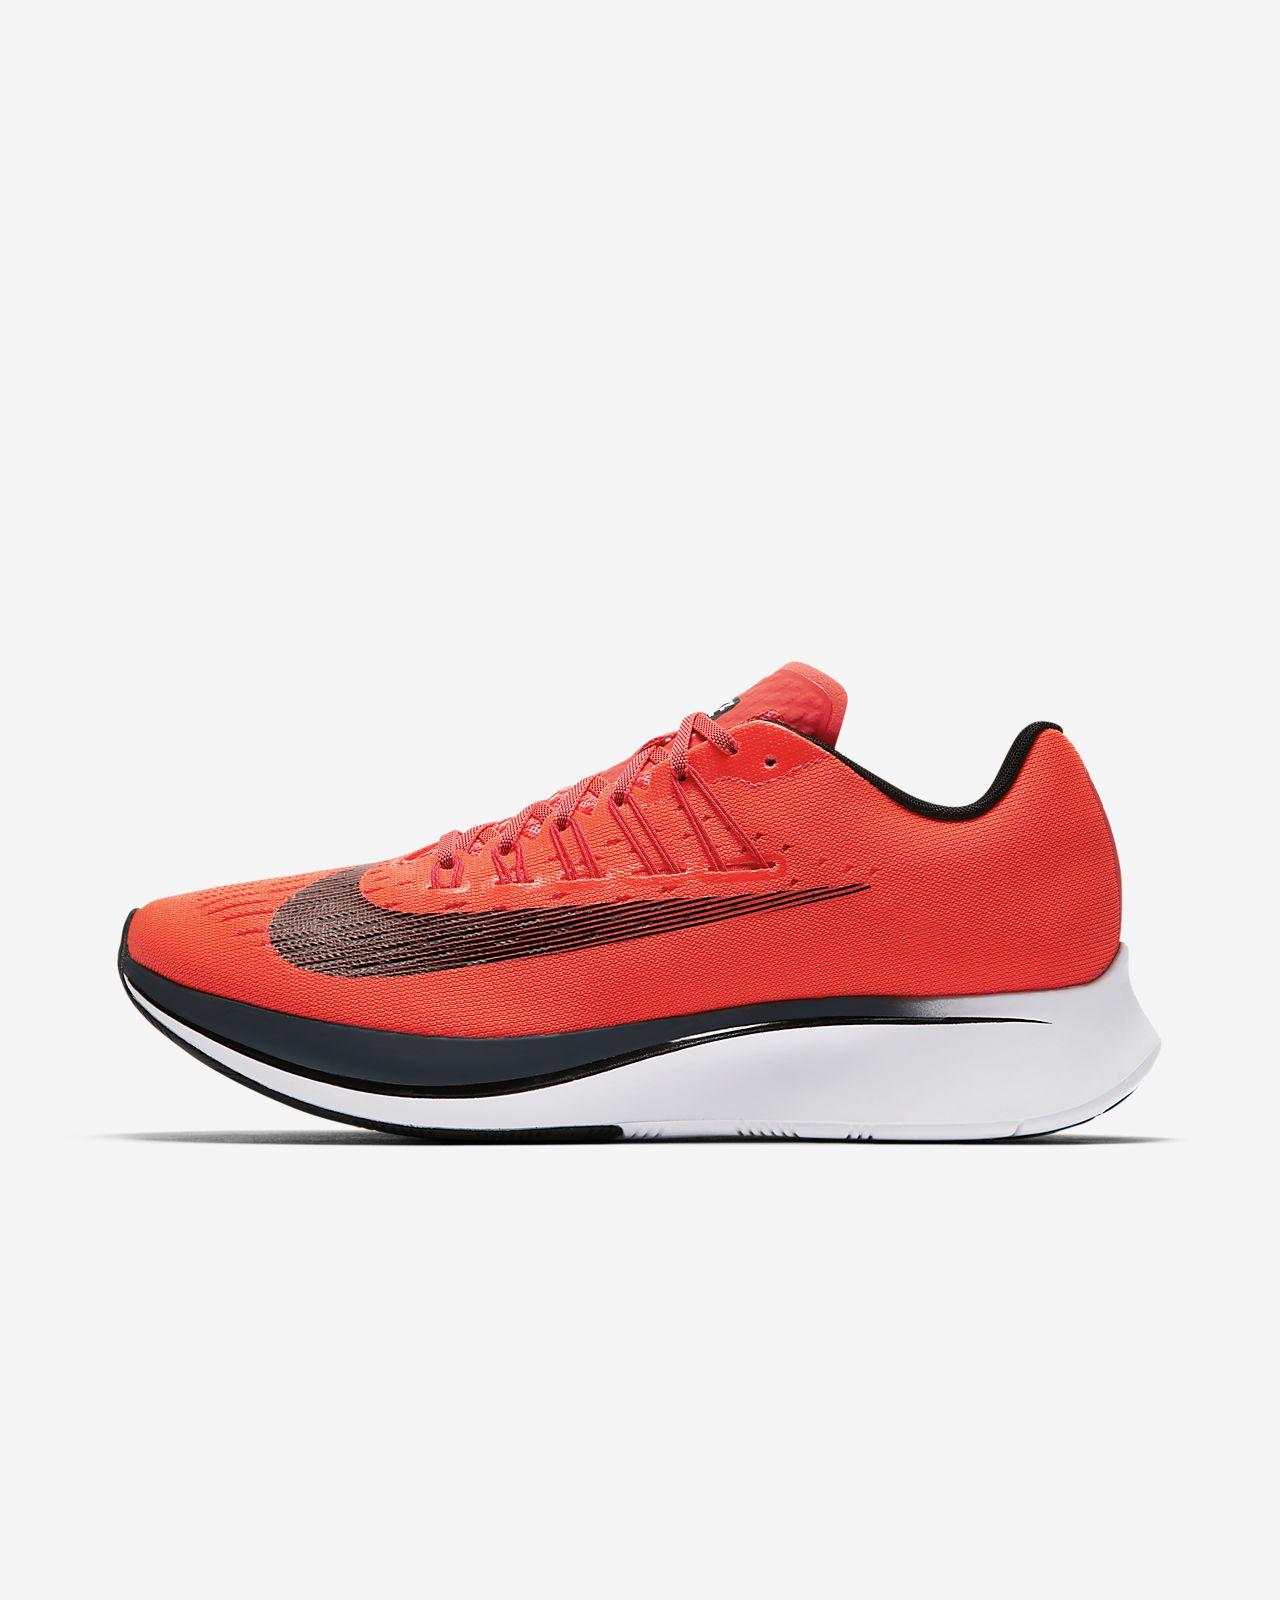 Course Chaussure bleu Us 39 Eu De Zoom Nike Femmes 8 Fly wafASqX e0c416d30db